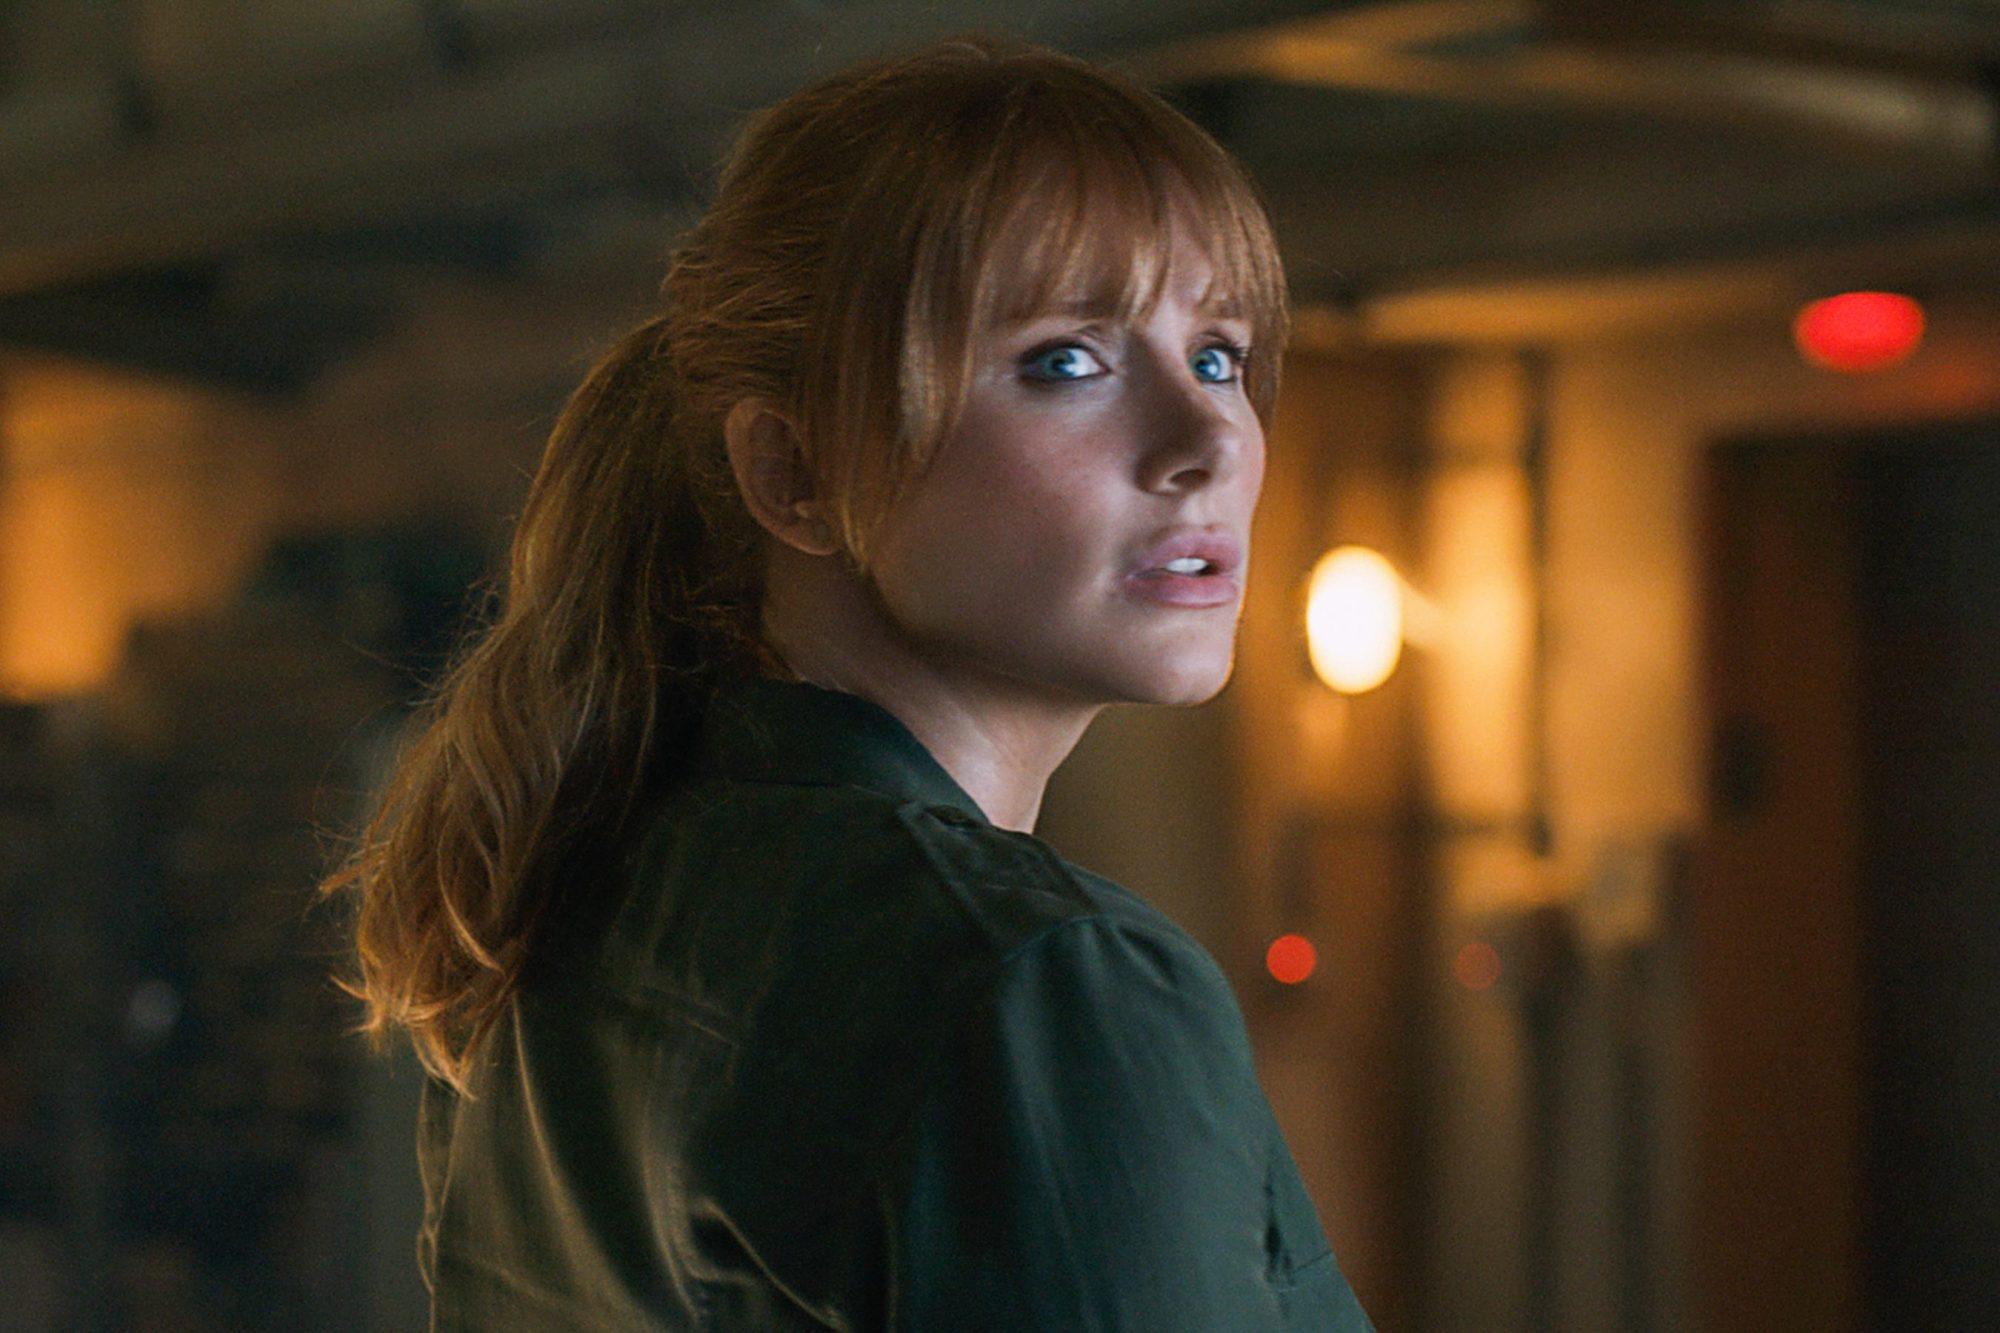 Jurassic World Star Bryce Dallas Howard Reveals Her